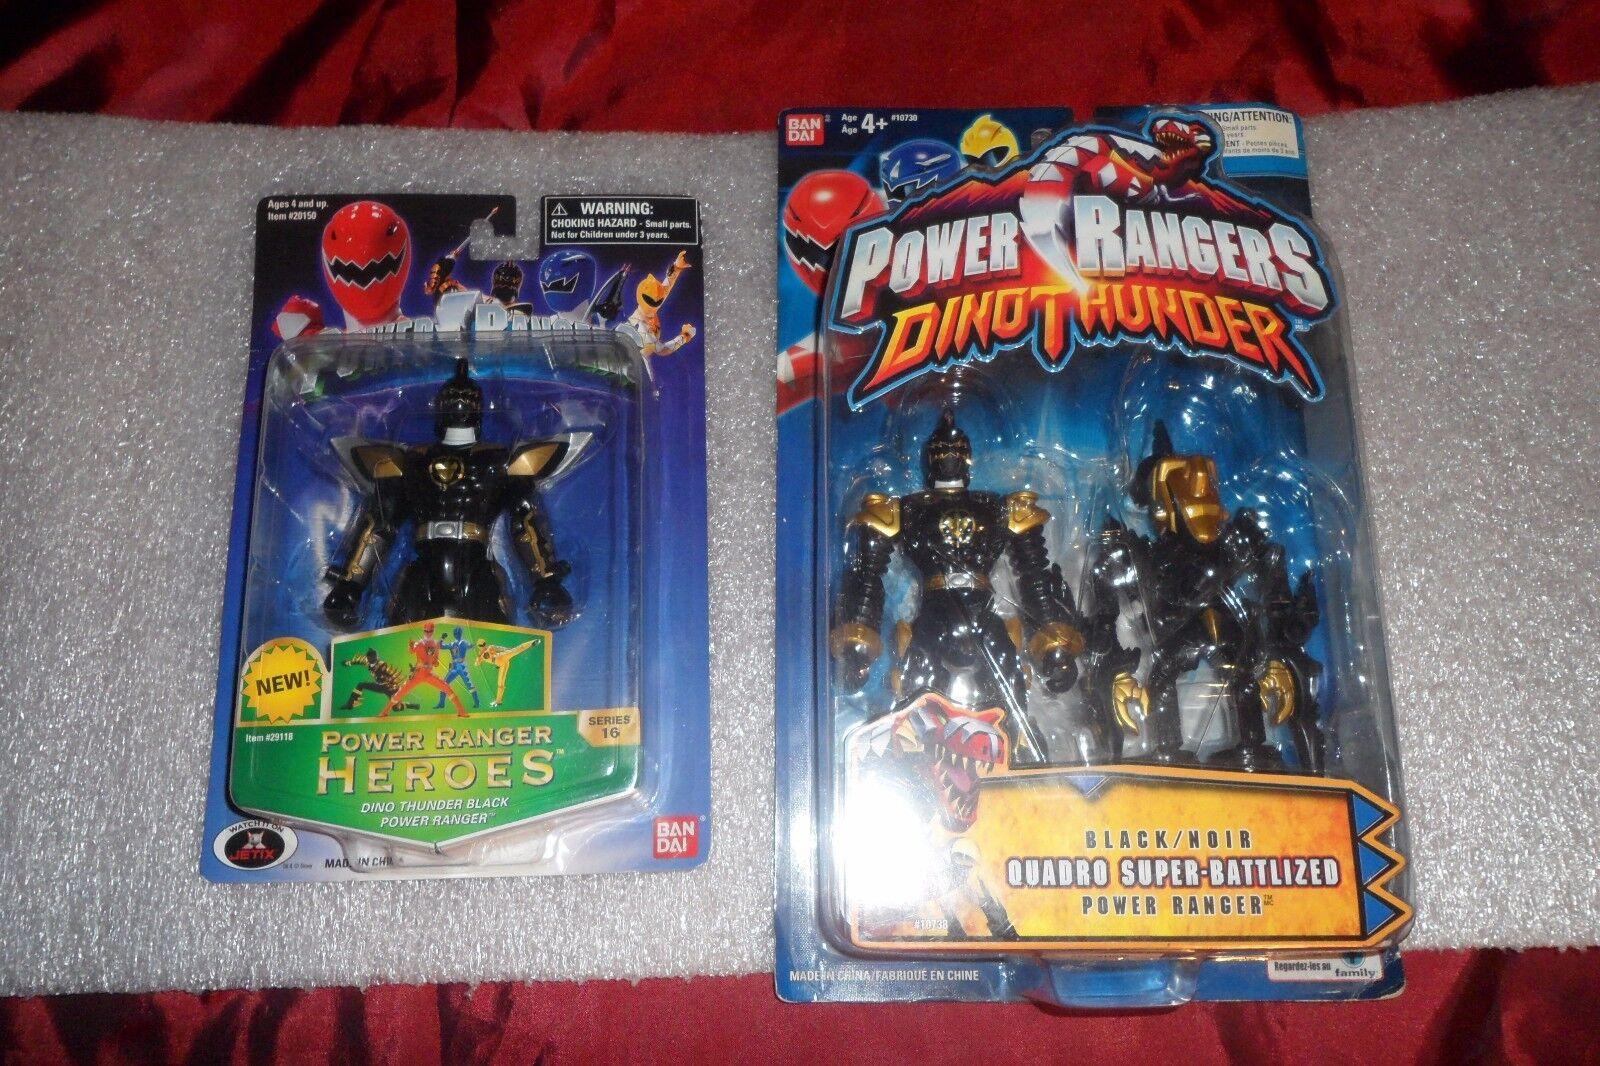 Power Rangers Dino Trueno héroes de la serie 16 nero y Quadro Super-Battlized menta en tarjeta 2